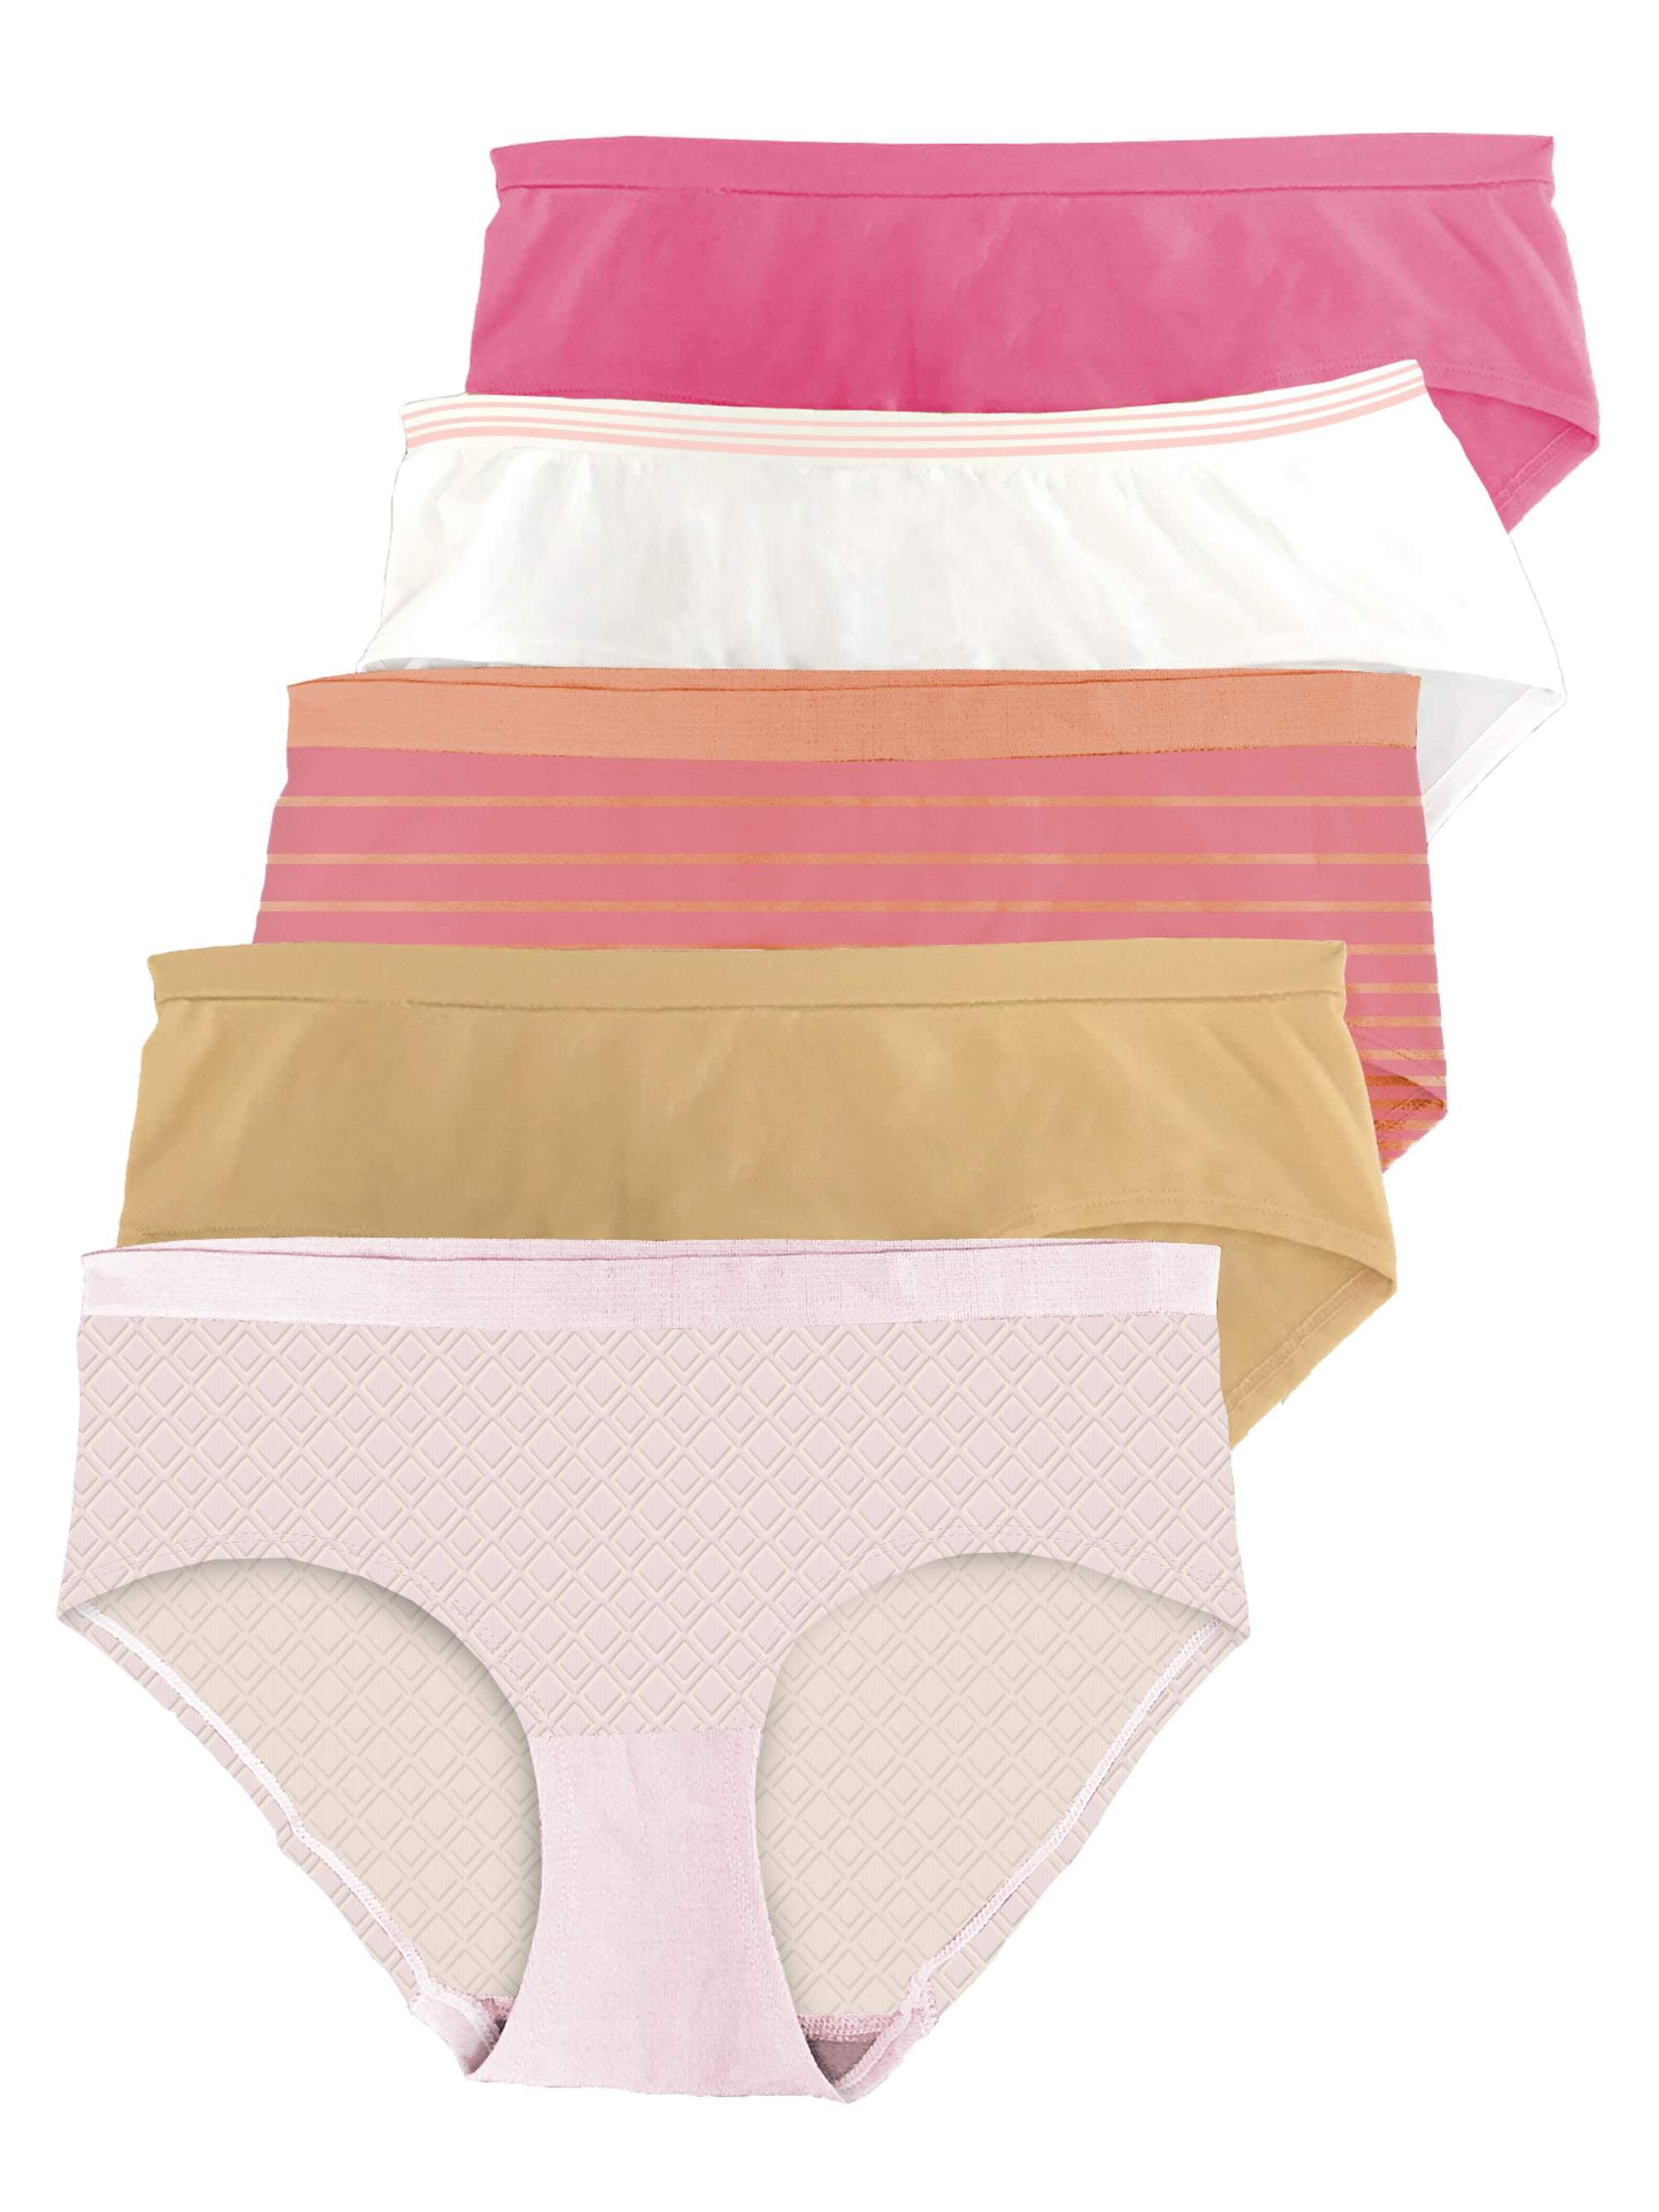 Womens Cute Turtle Panties,Seamless Cotton Breathable Elastic Bikini Panty